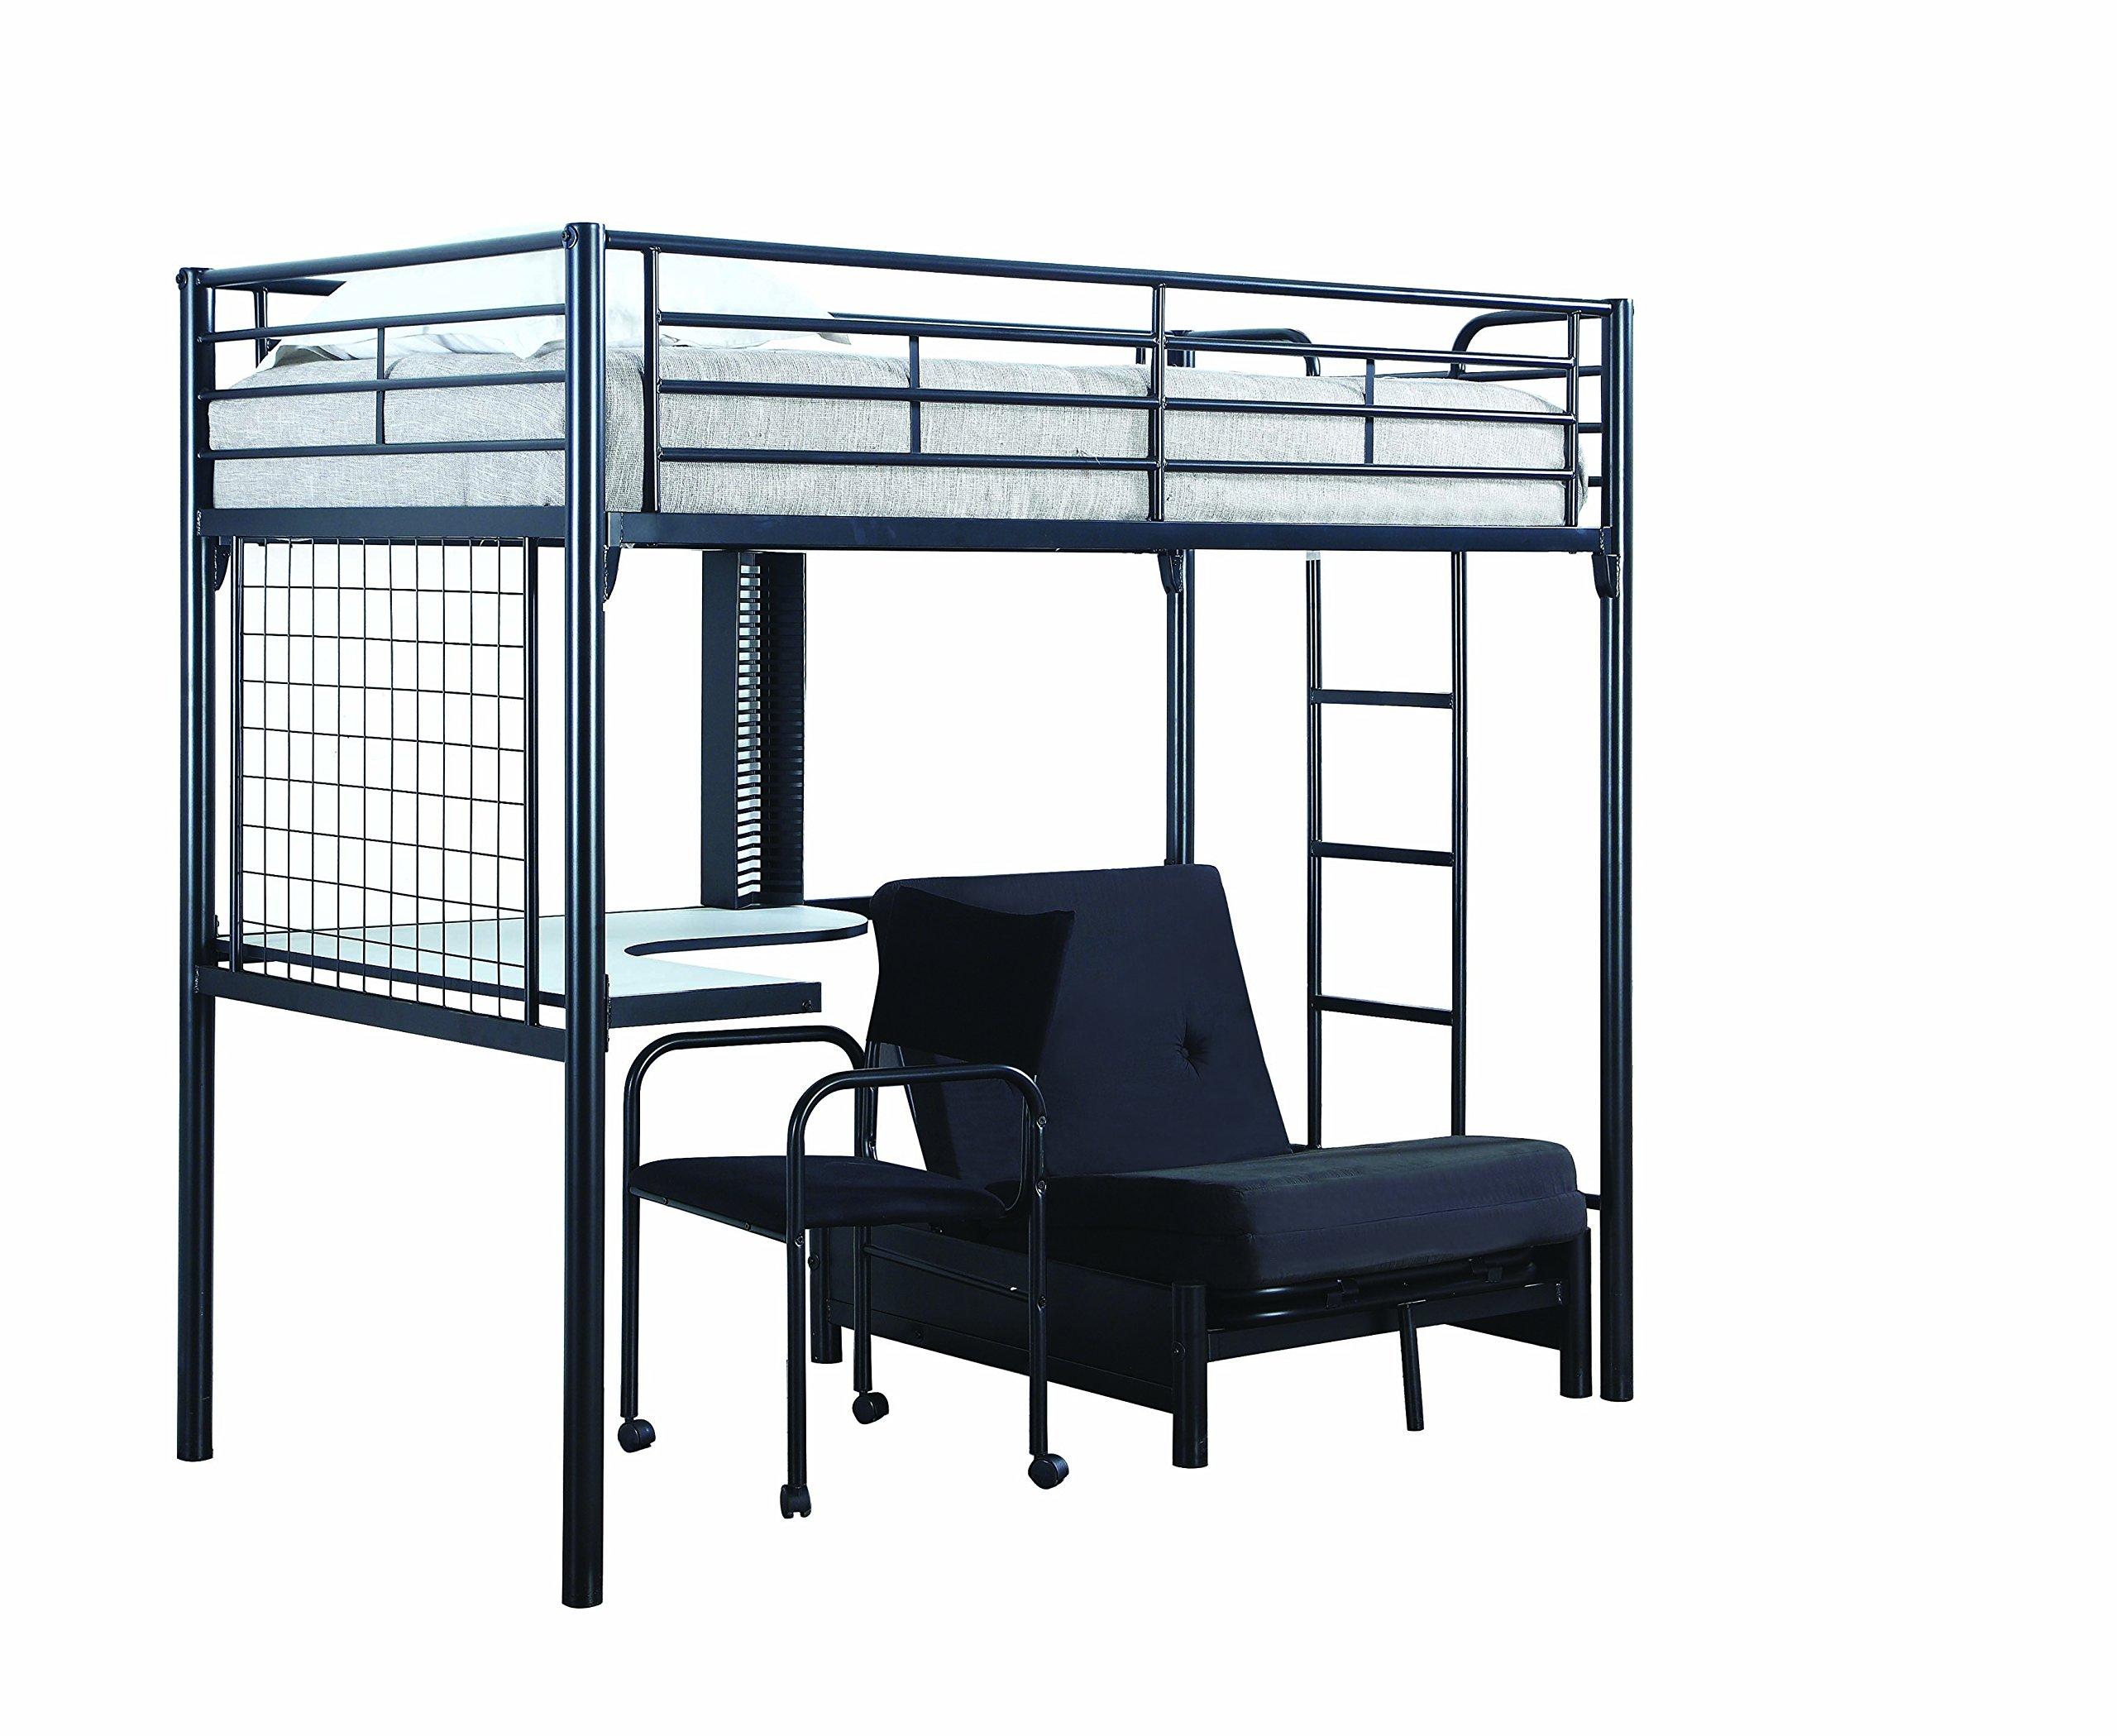 bunk bed couch. Black Bedroom Furniture Sets. Home Design Ideas